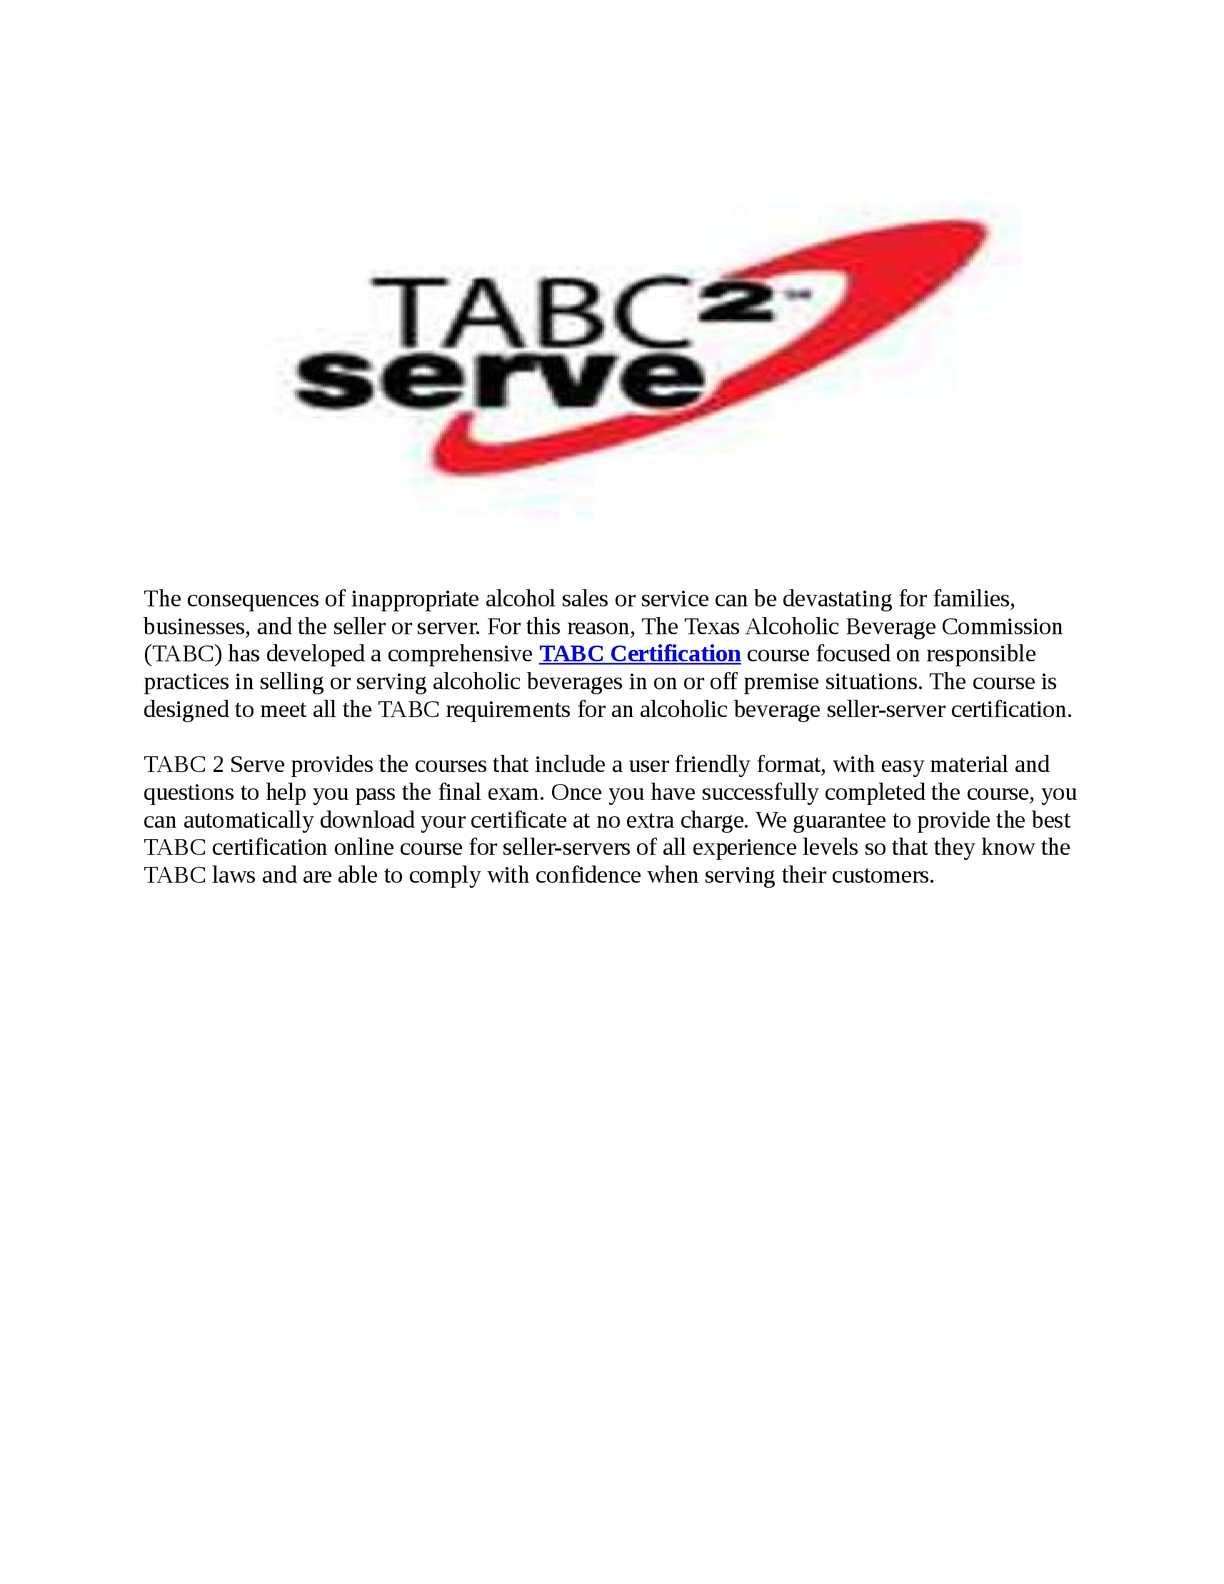 Calamo Tabc Certification Courses